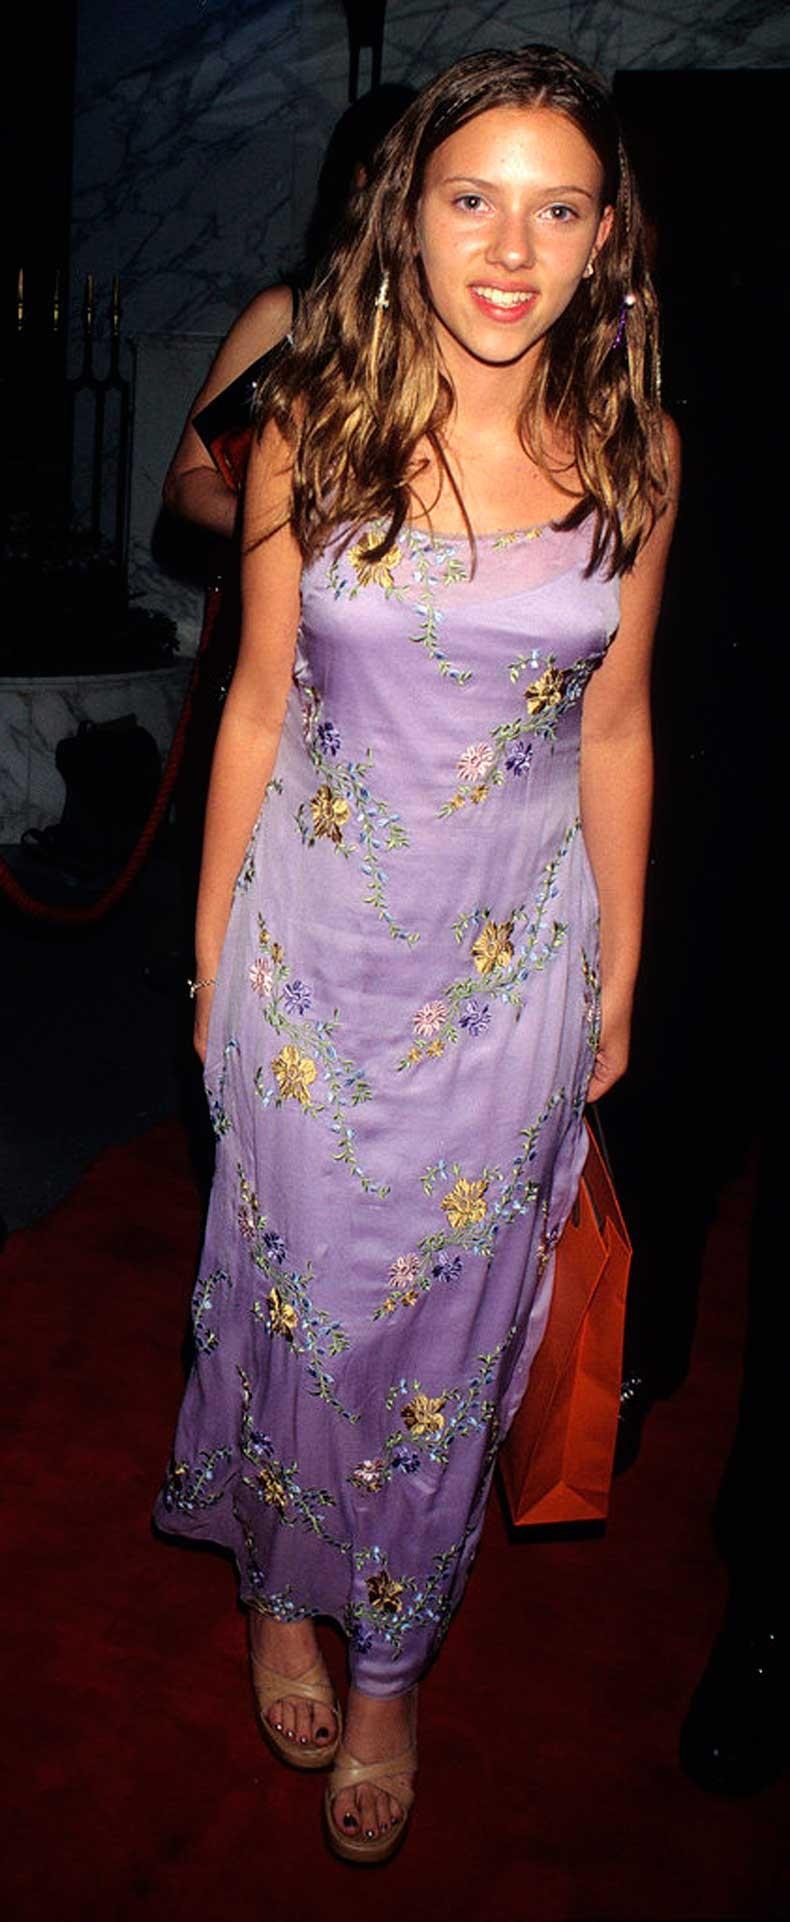 Scarlett-Johansson-1998